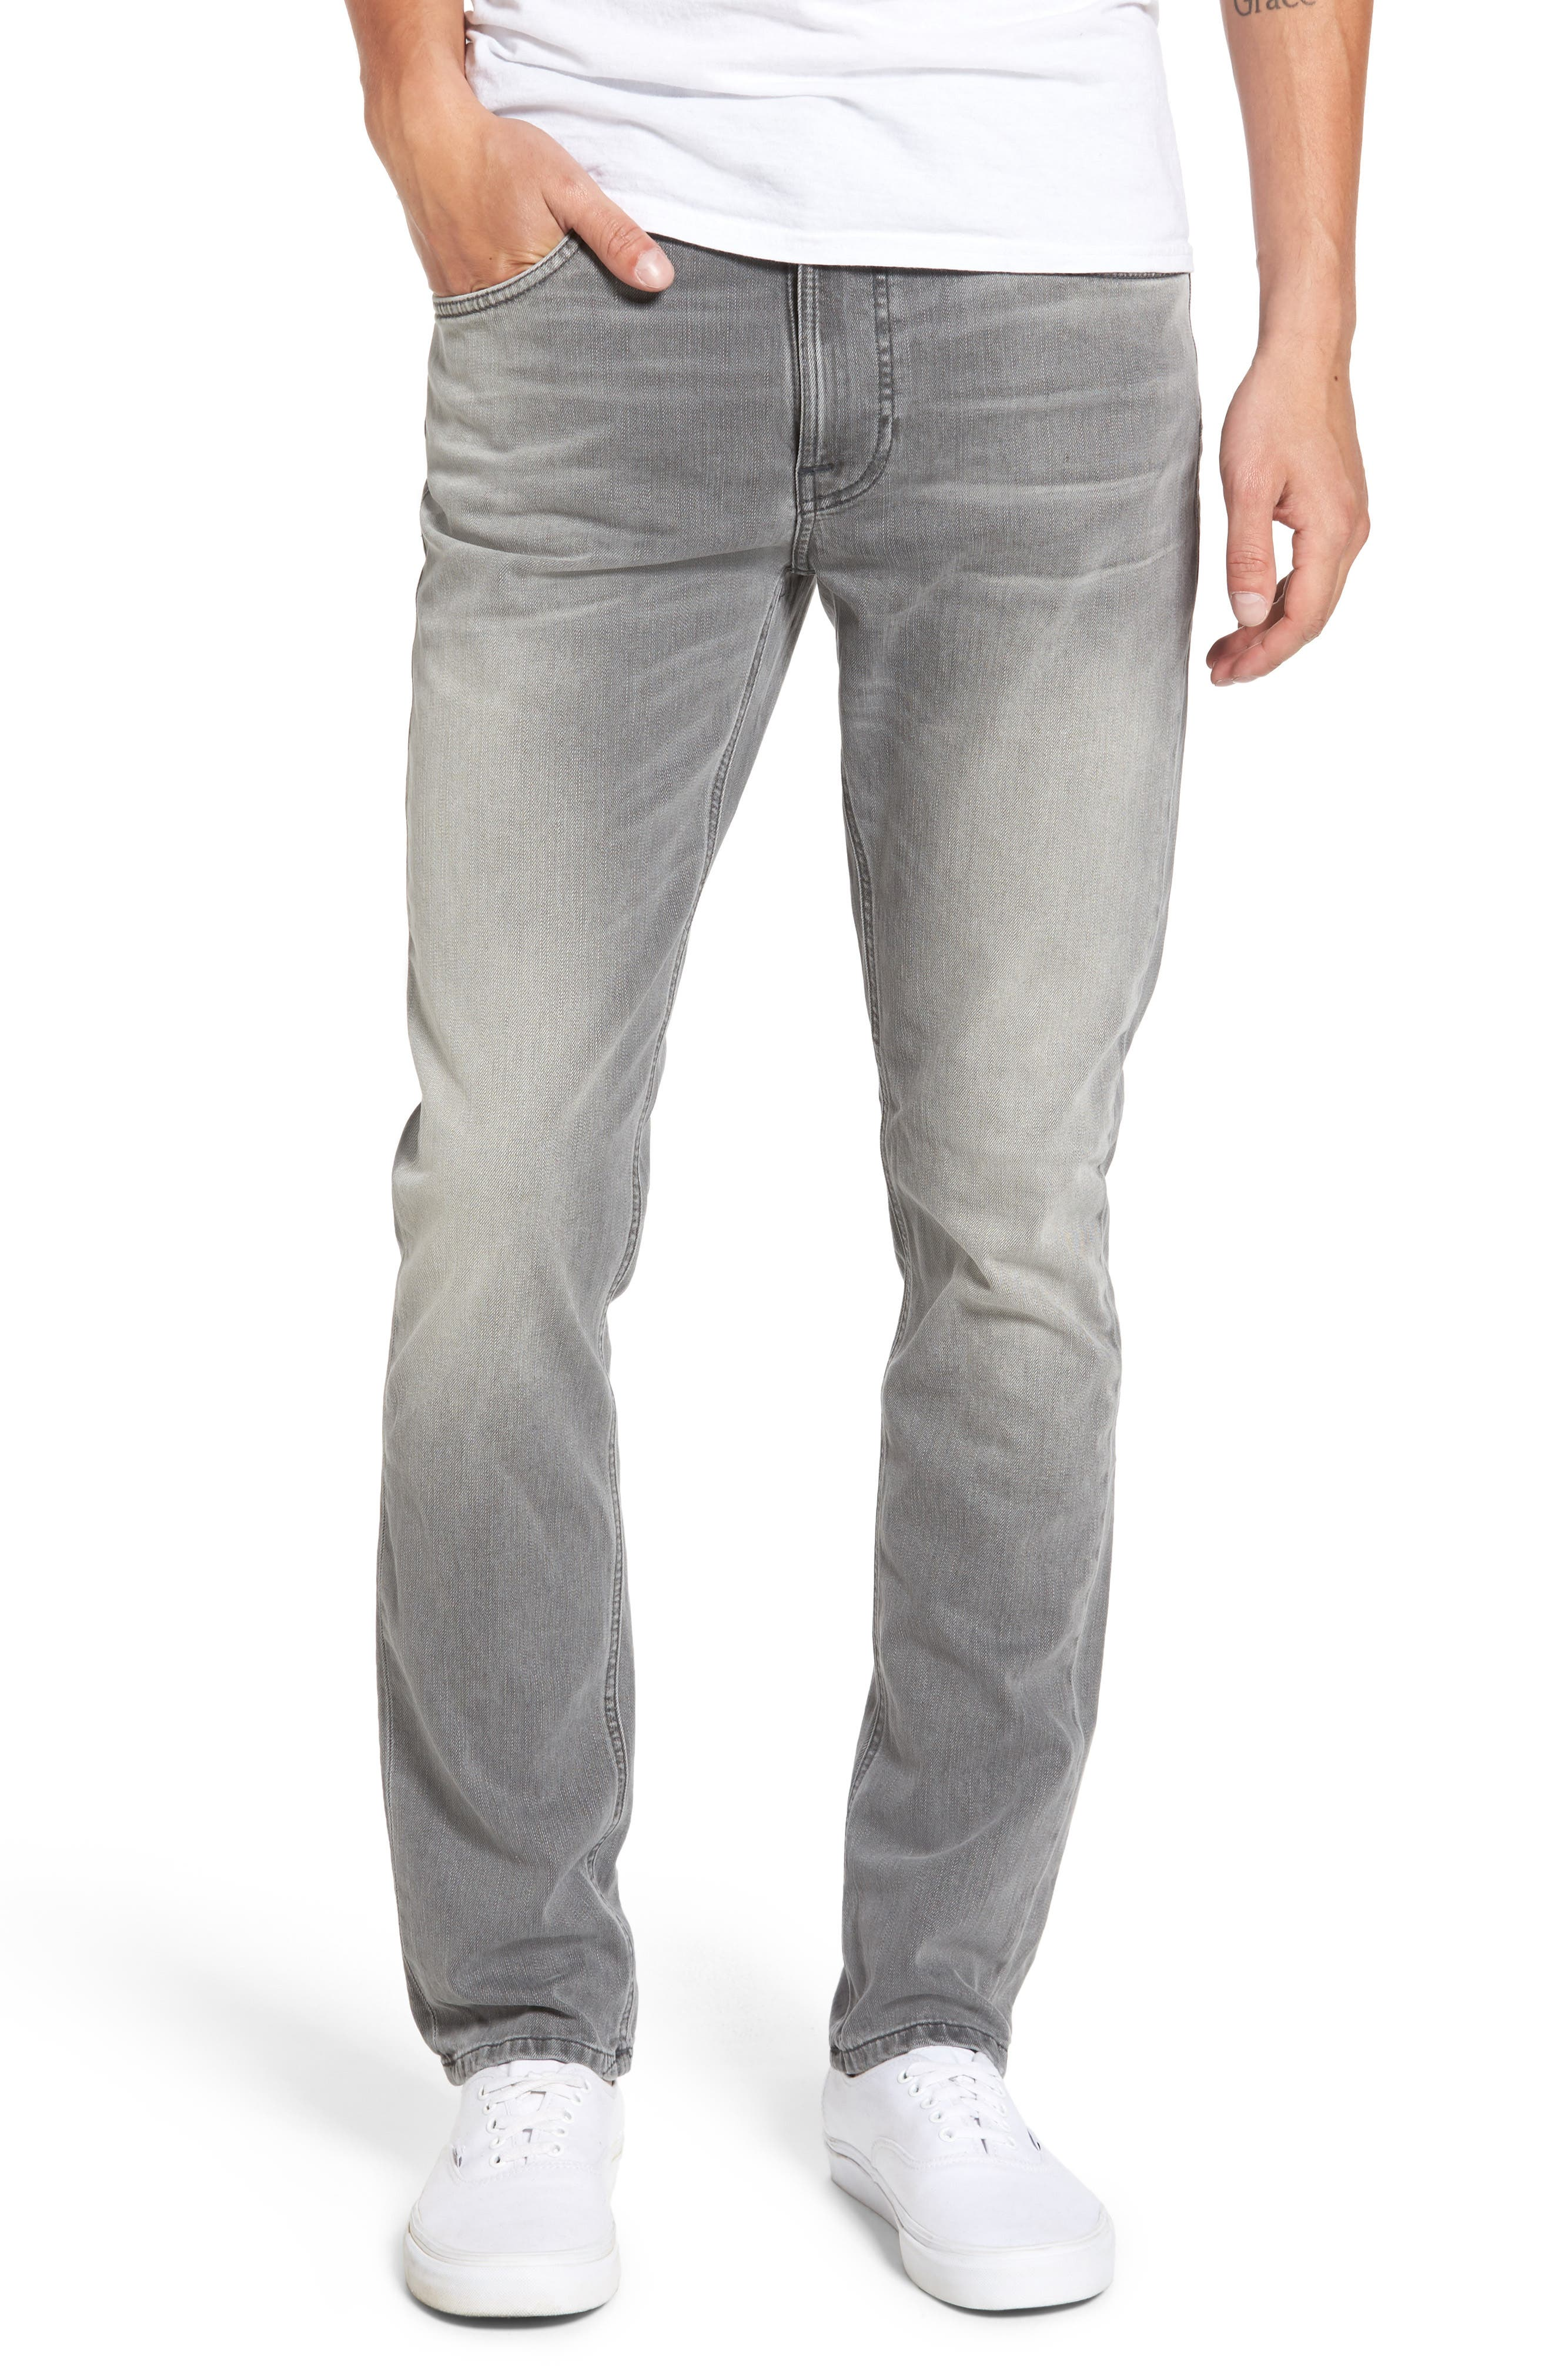 Alternate Image 1 Selected - Nudie Jeans Lean Dean Slouchy Skinny Fit Jeans (Grey Ace)